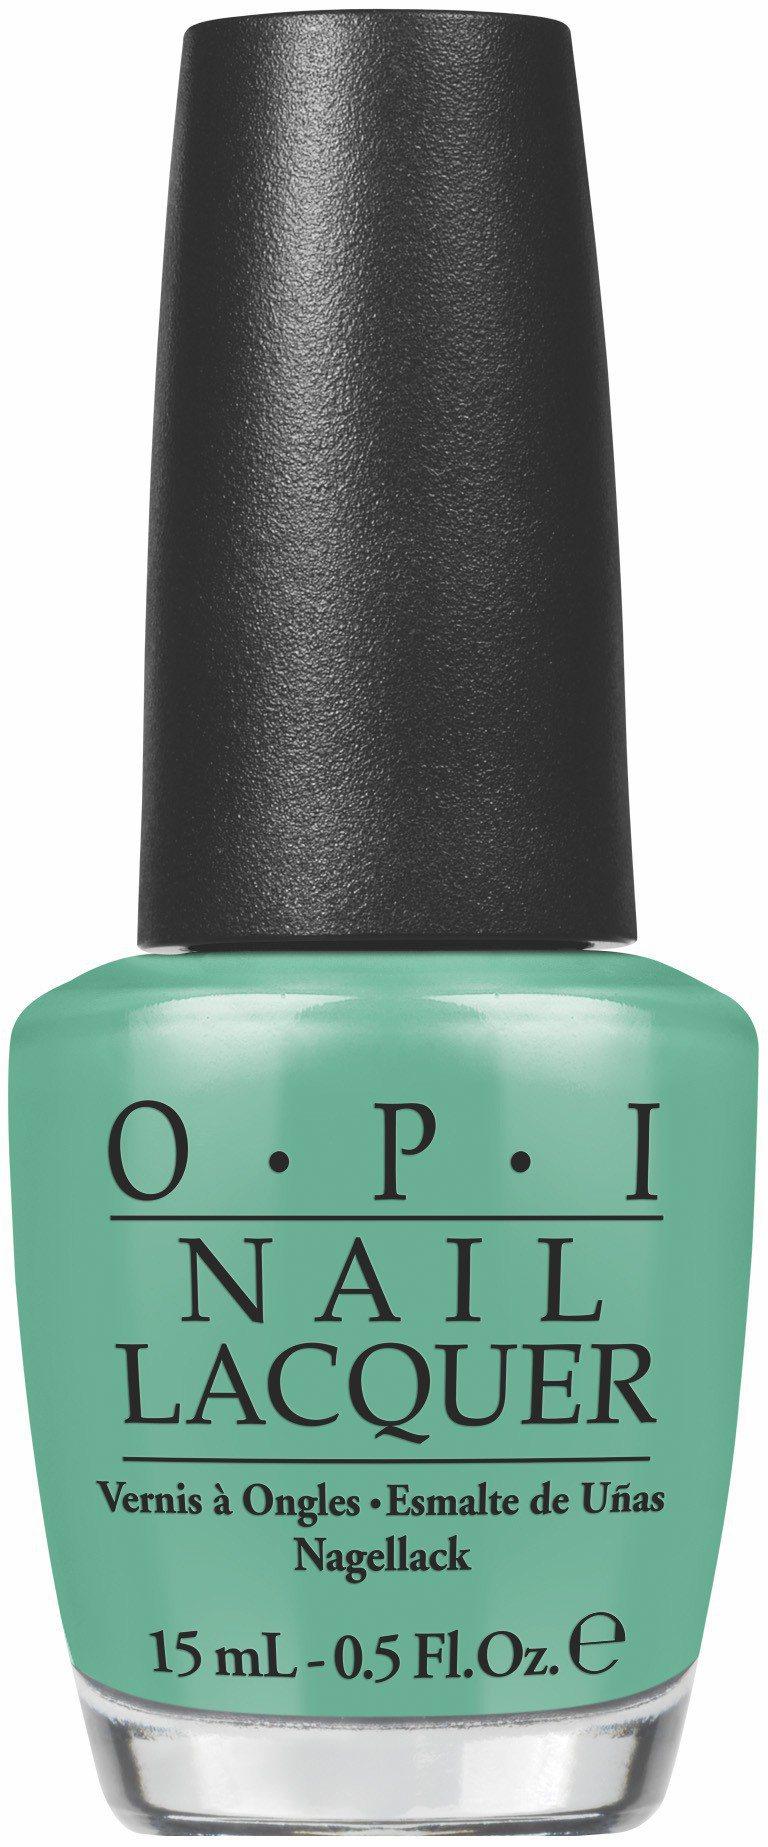 OPI推薦4款春夏熱銷的藍綠色系指彩,圖為#NLN45極北國度。圖/OPI提供